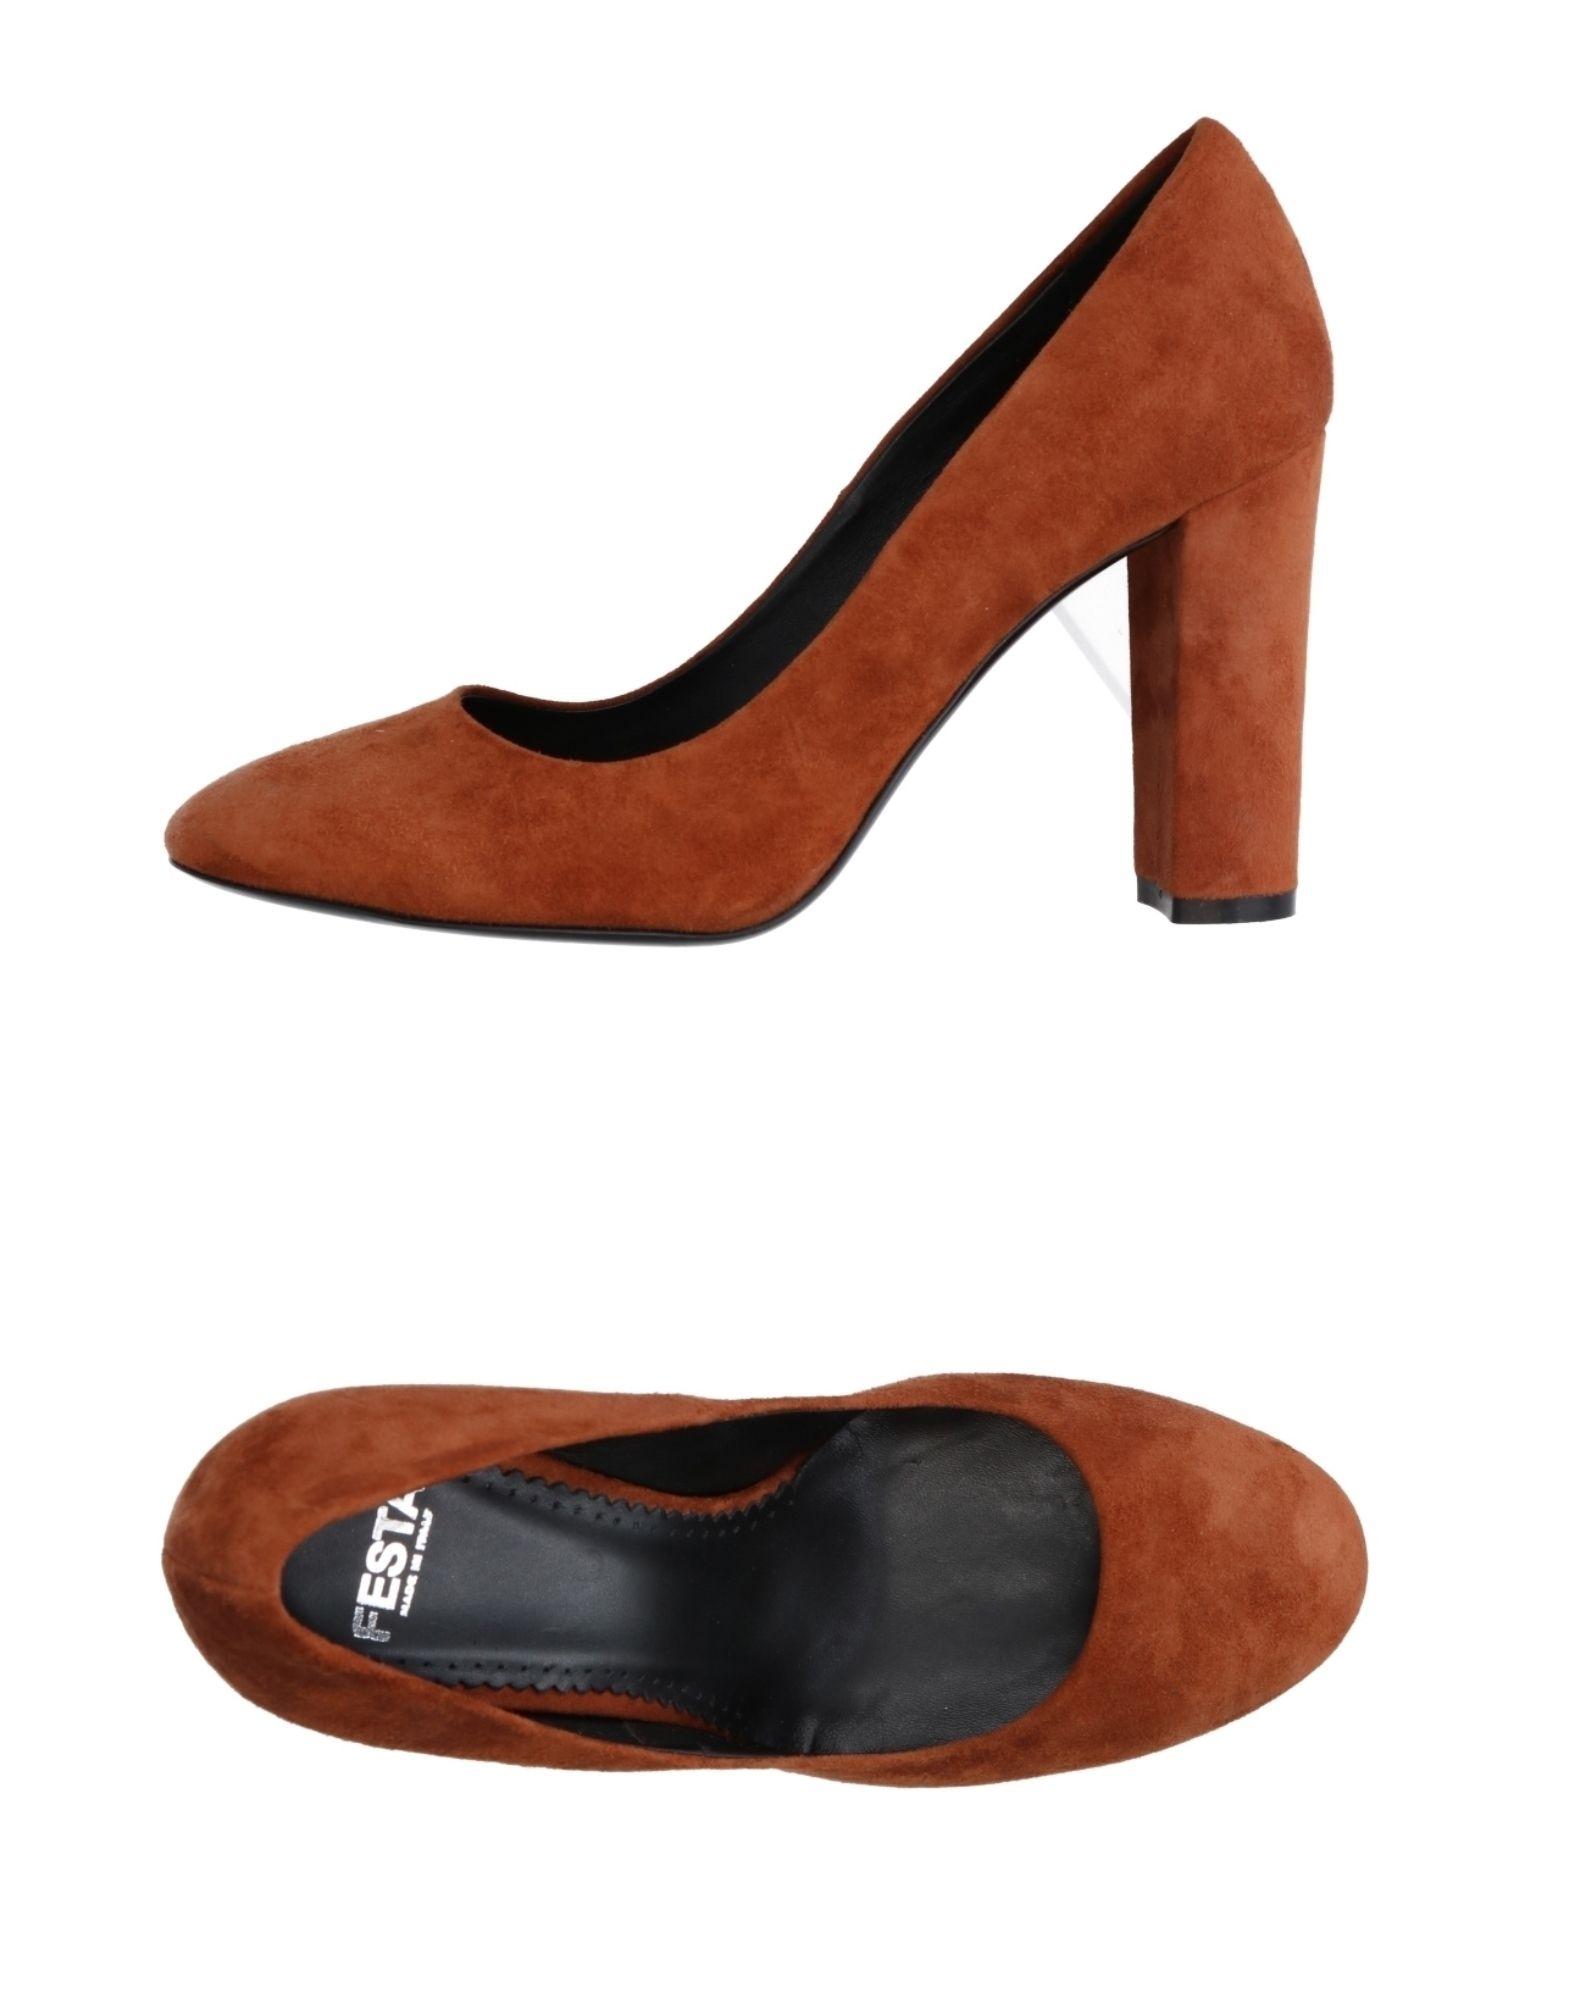 Festa Milano Pumps Damen beliebte  11245873MT Gute Qualität beliebte Damen Schuhe 0f22bd